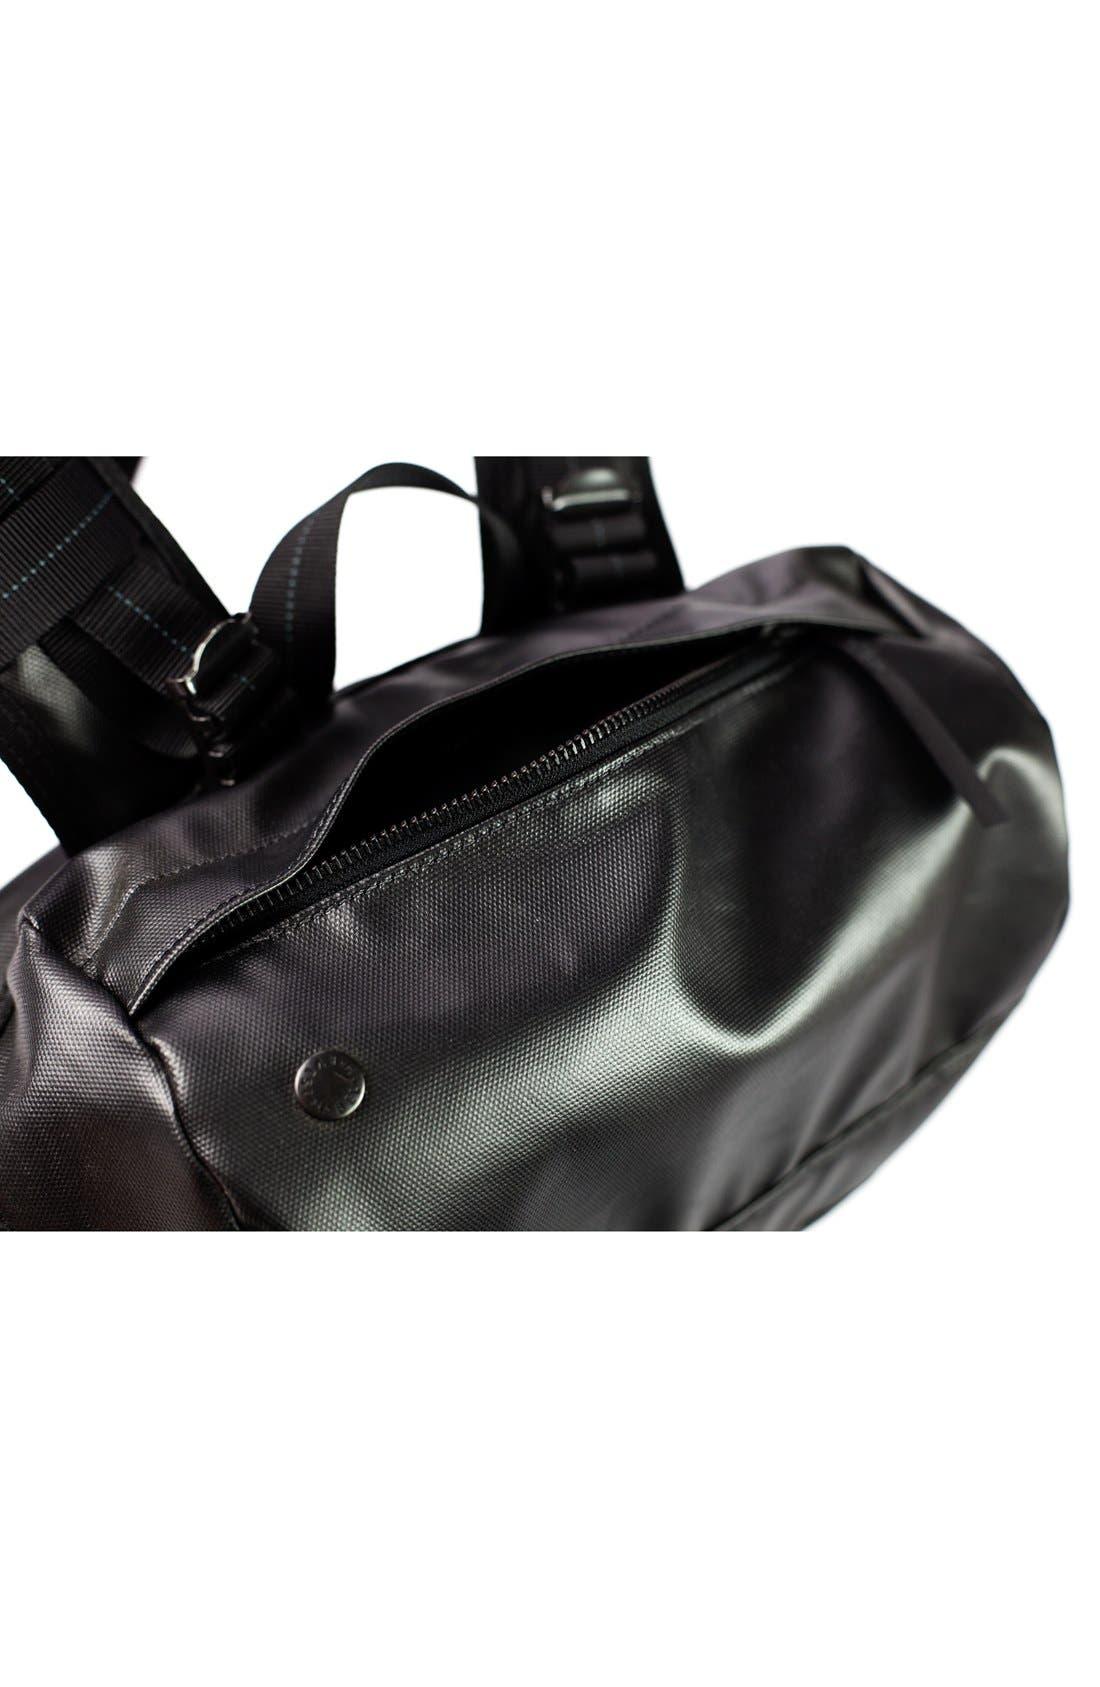 'NightHawk' Backpack,                             Alternate thumbnail 7, color,                             Black